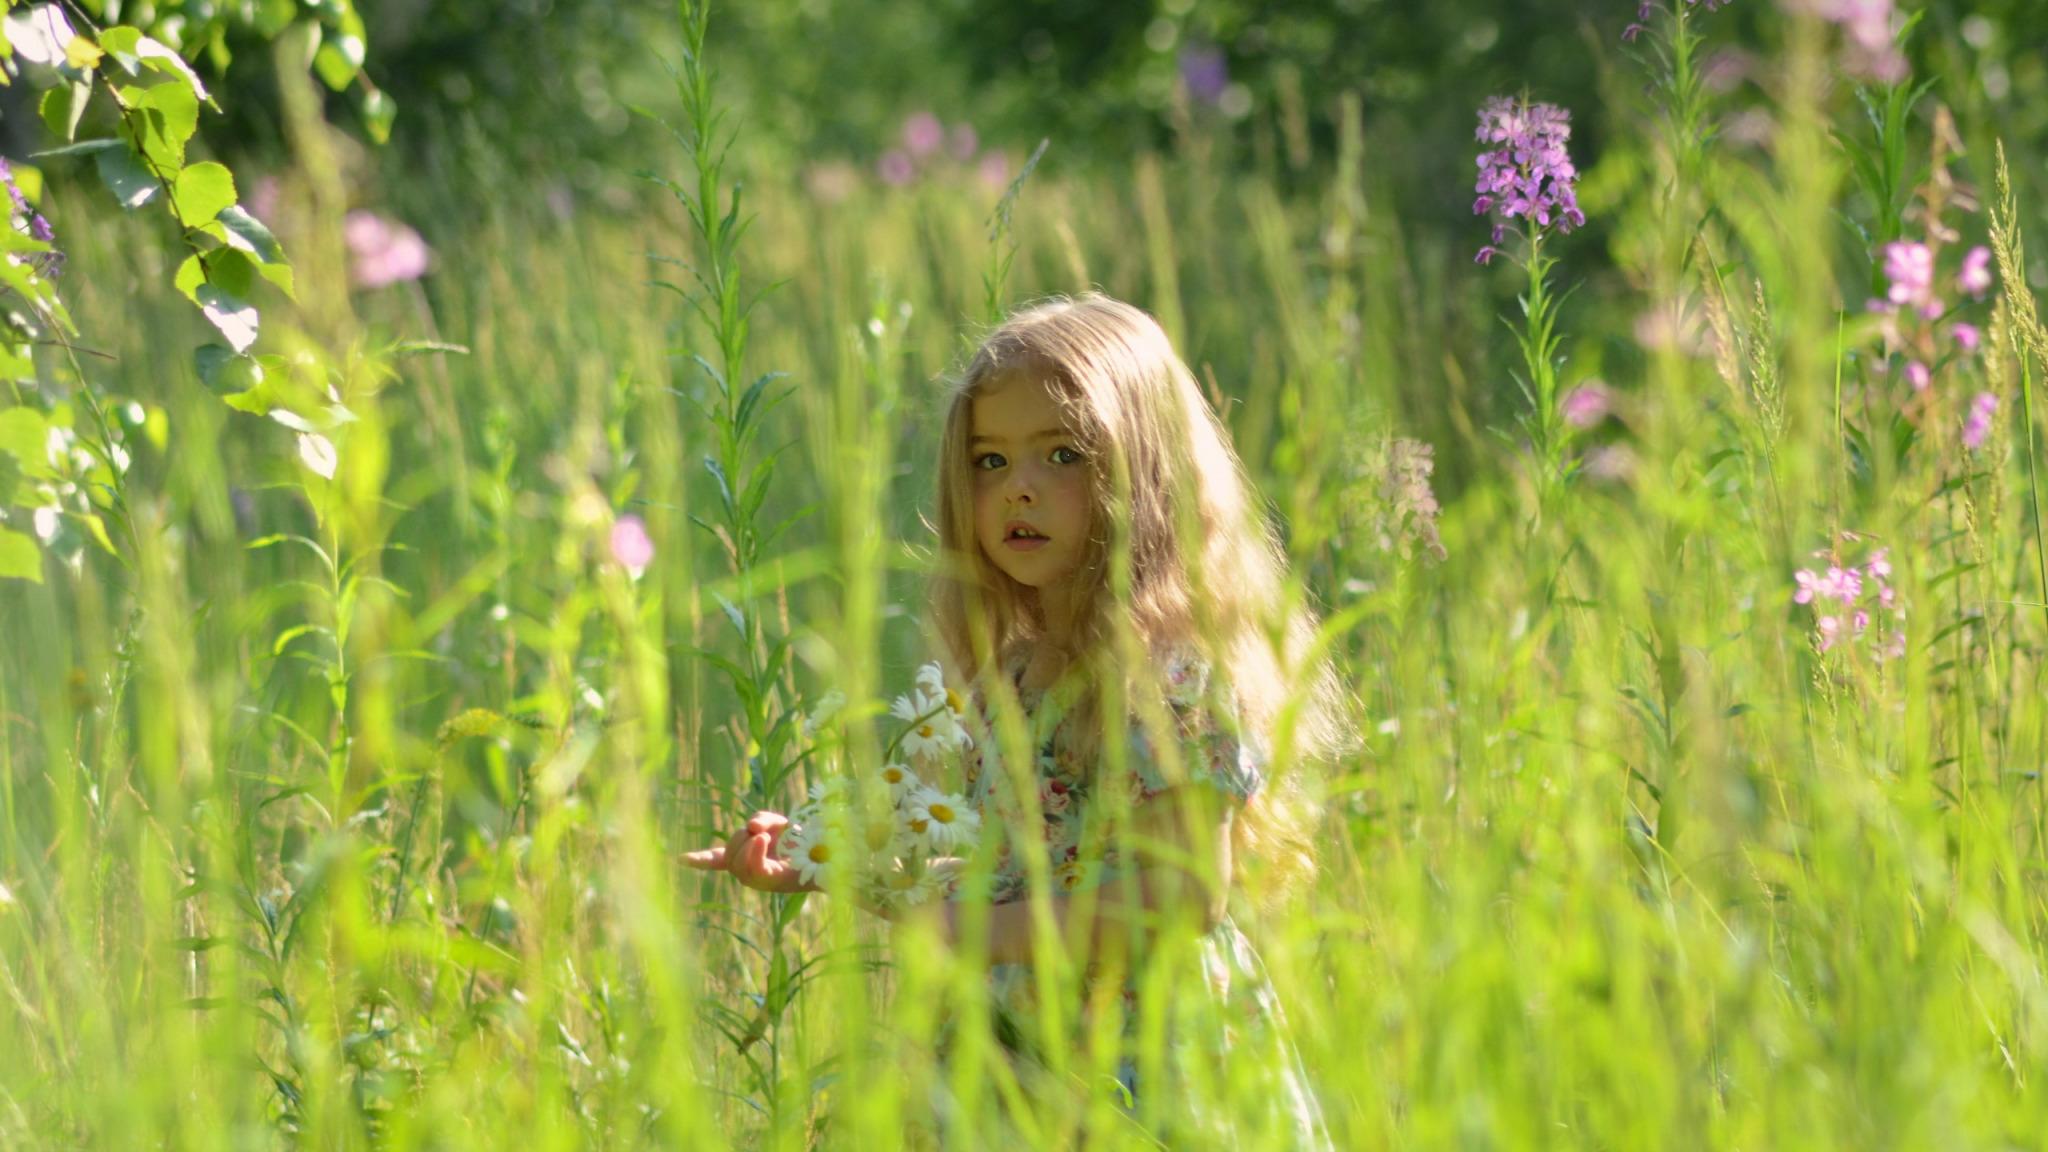 Девушка в траве  № 559828 без смс